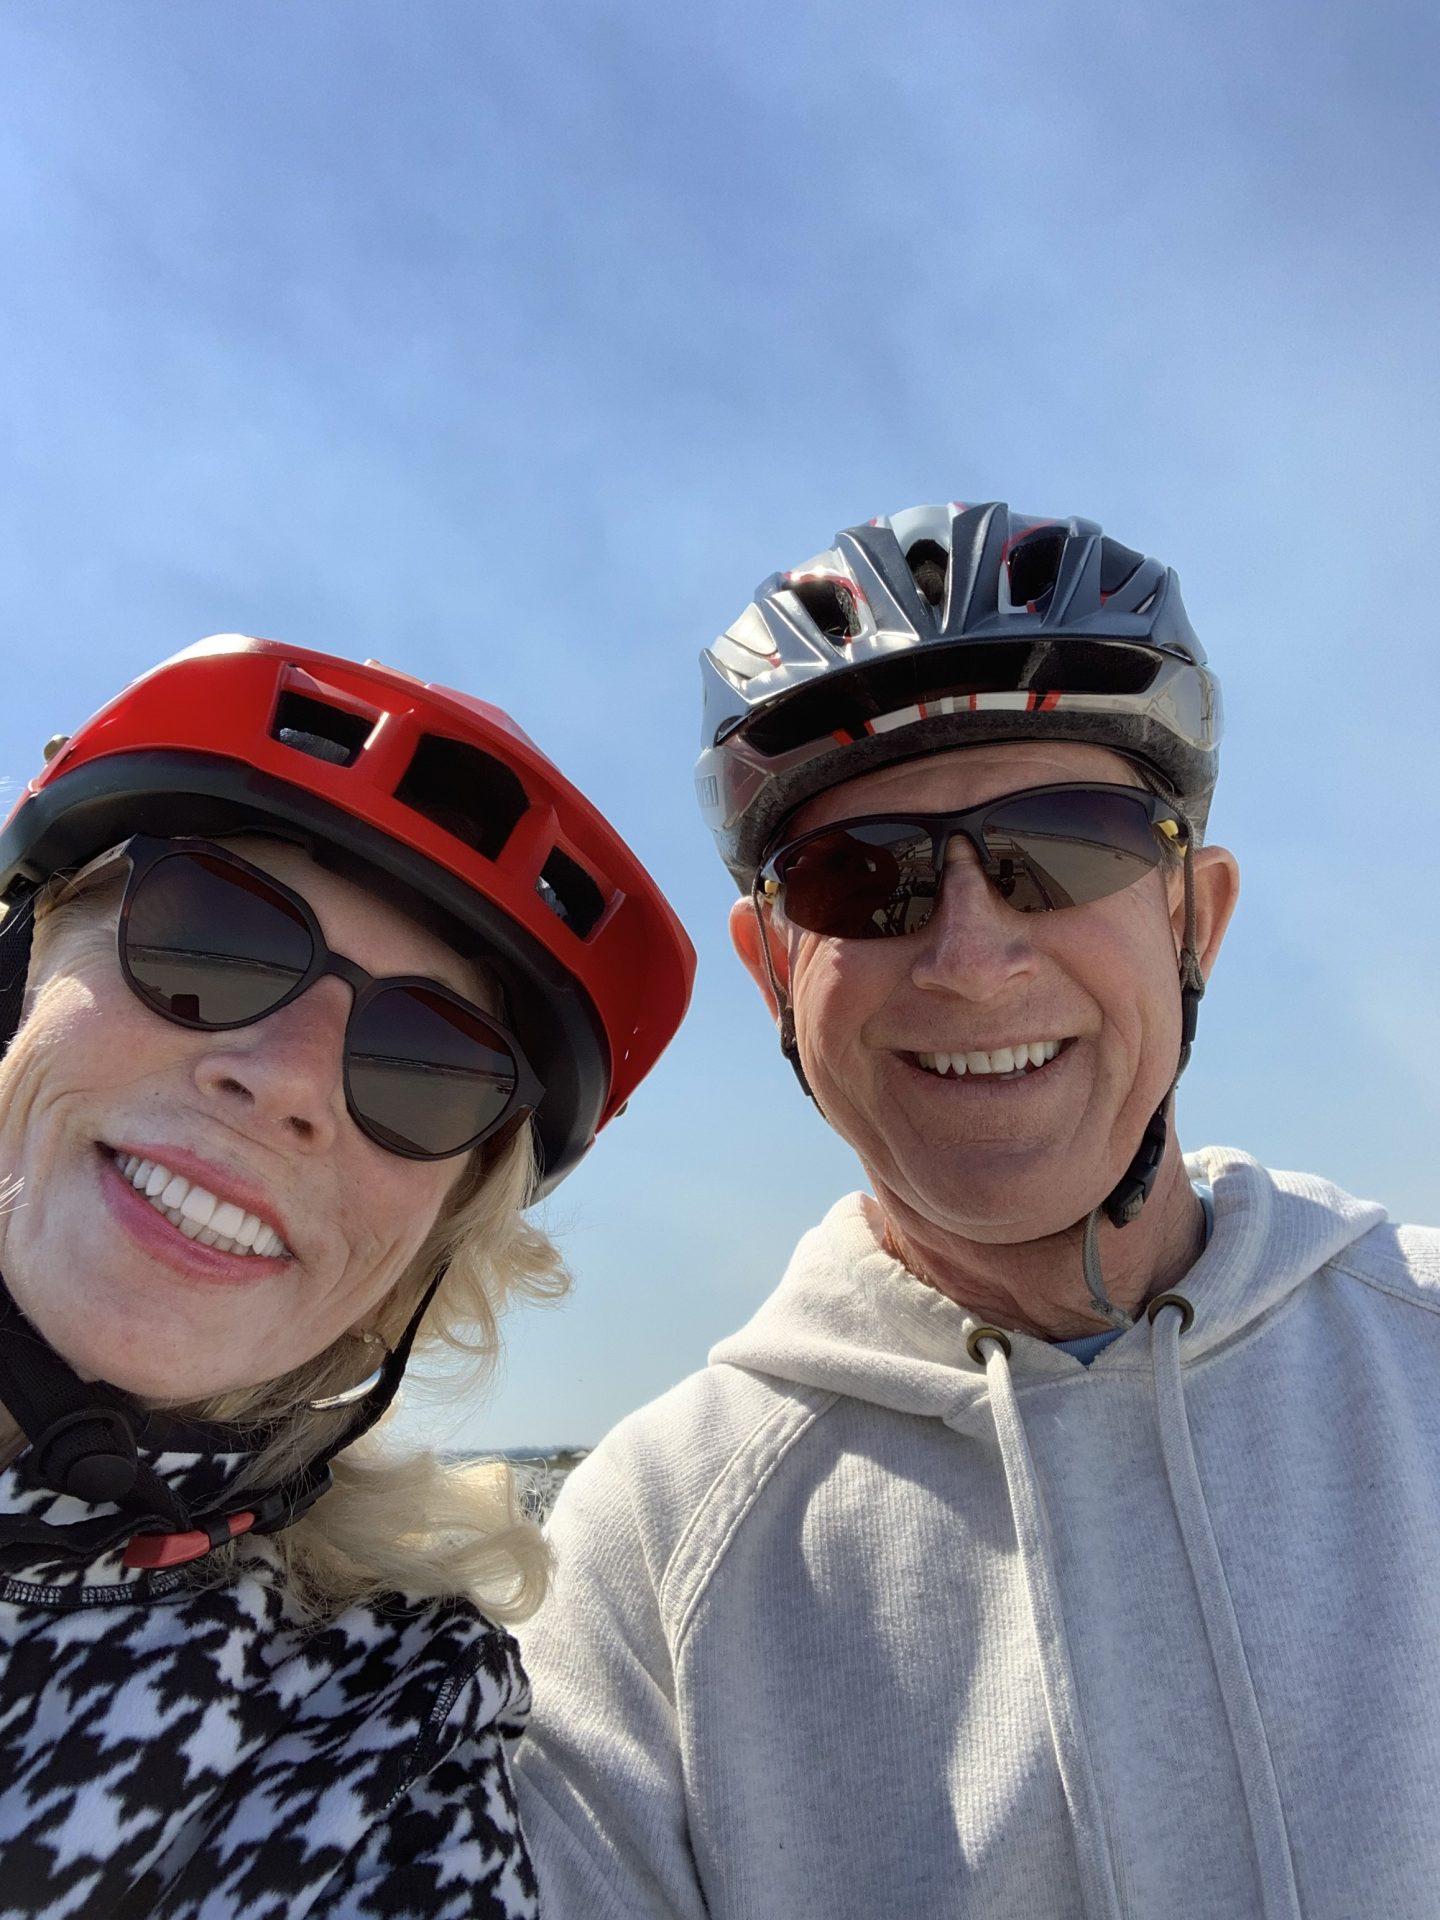 Biking at Ponce Inlet last fall